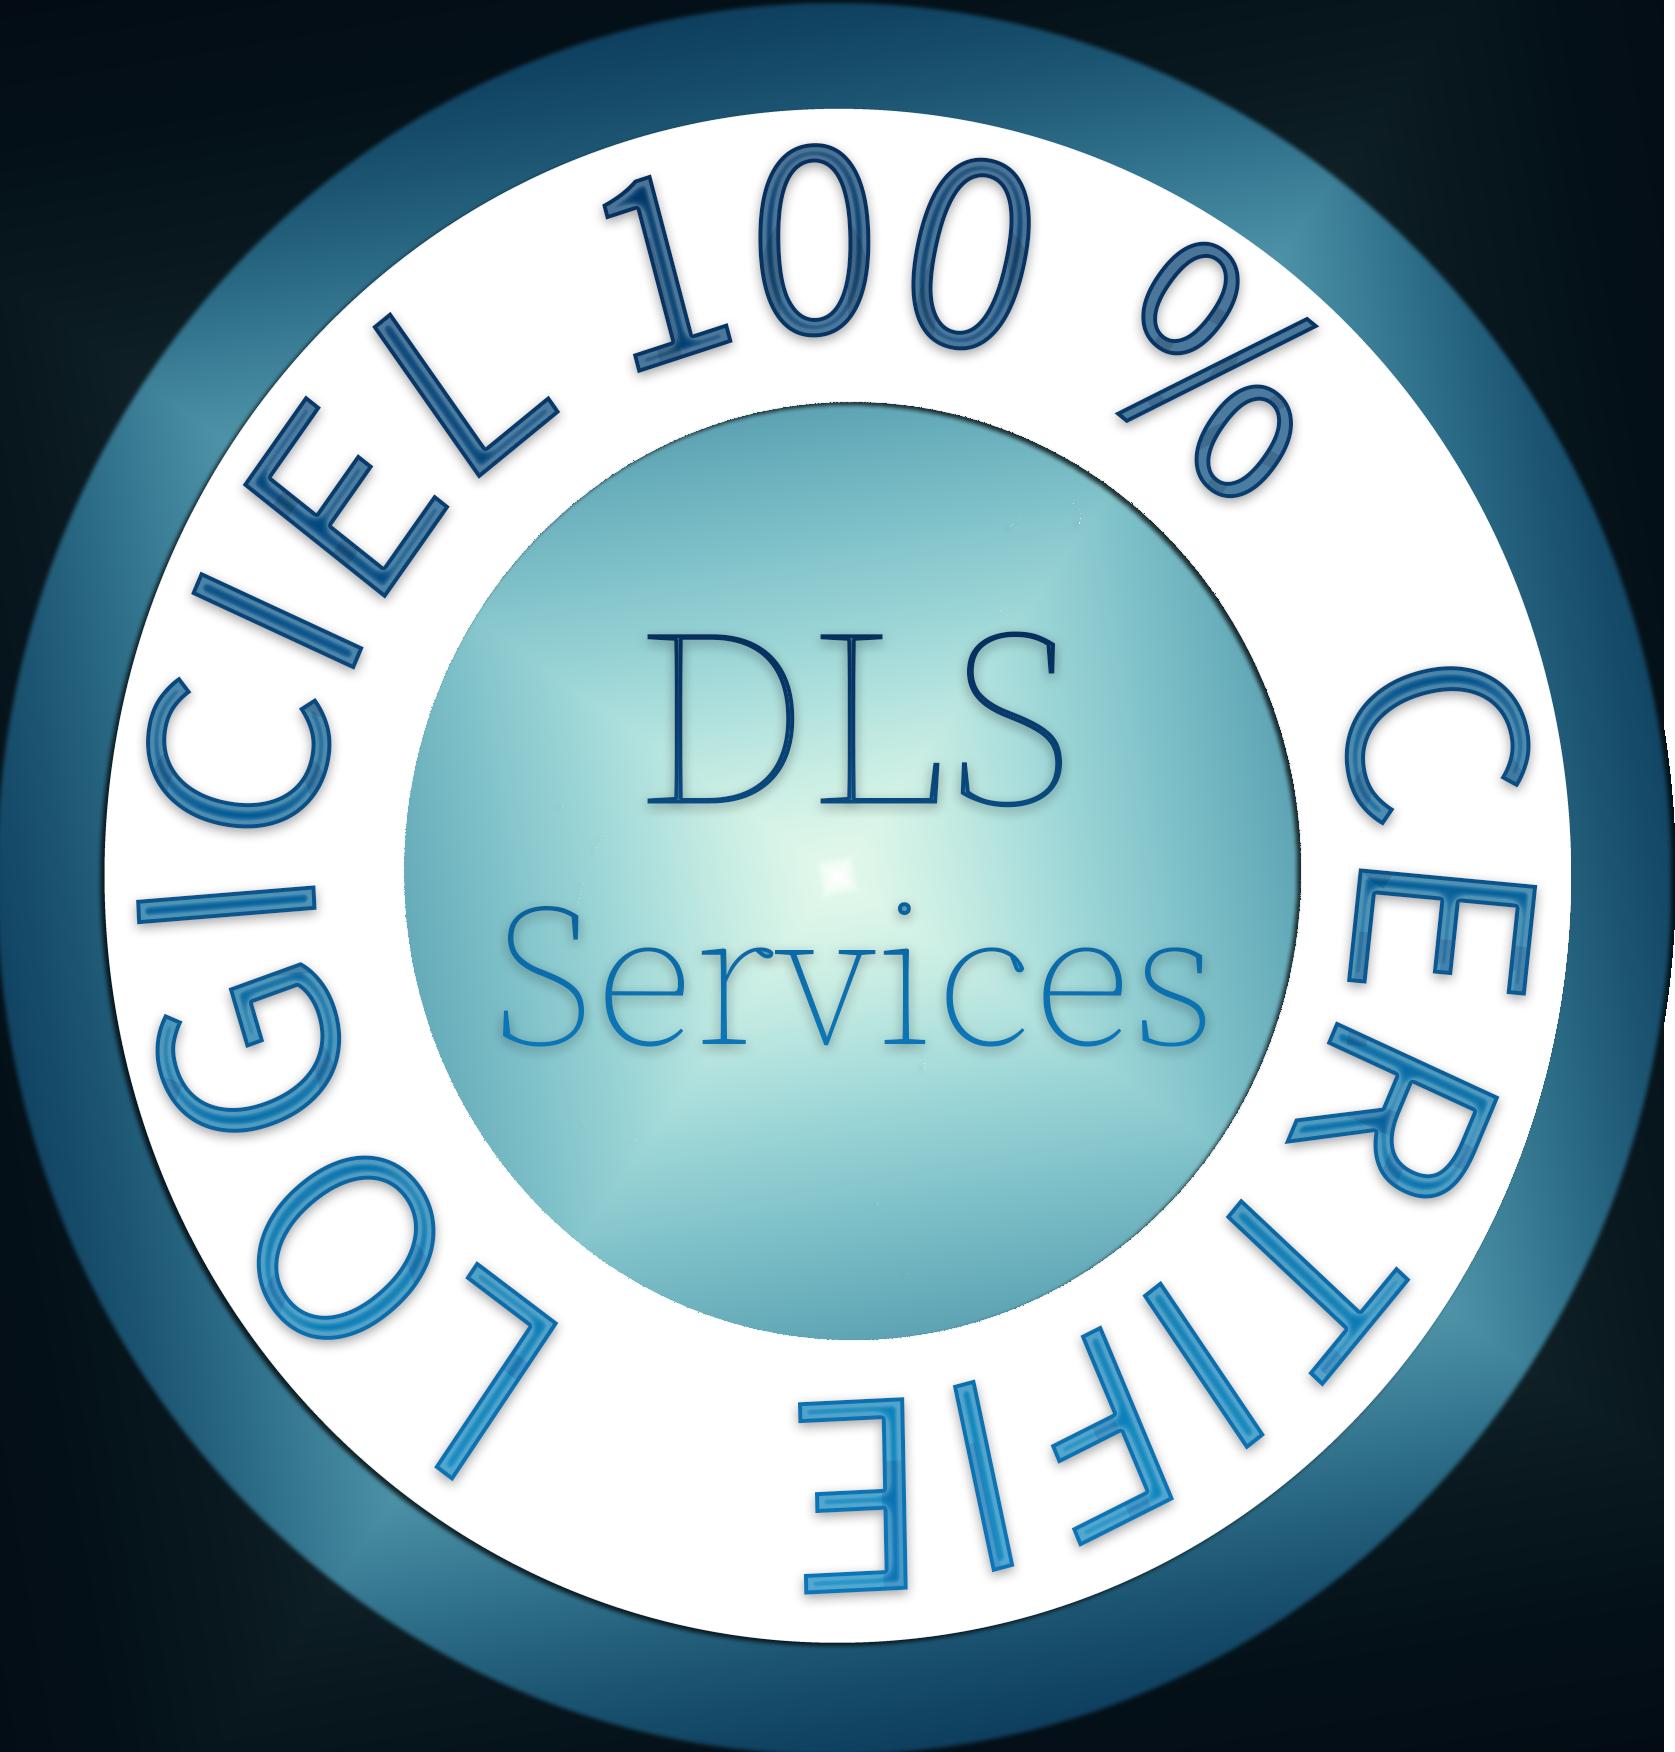 logiciel 100% certifié